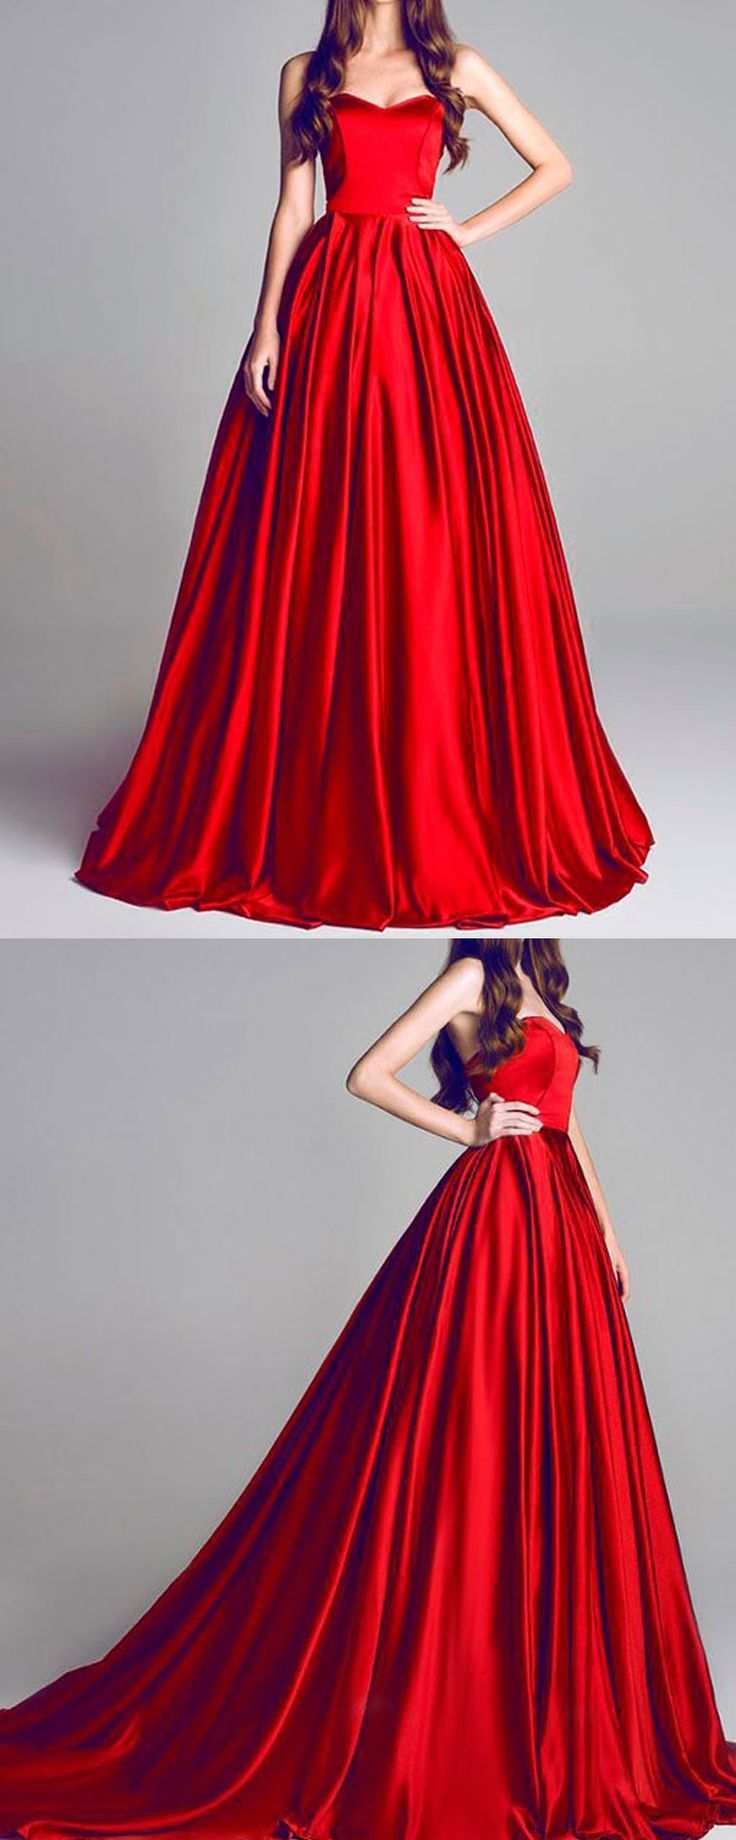 Long Cheap Prom Dresses, Elegant A-Line Evening Dress,Sweetheart Red Formal Dress,Floor-Length Evening Dress,Chic Prom Dress 2017,Prom Dresses